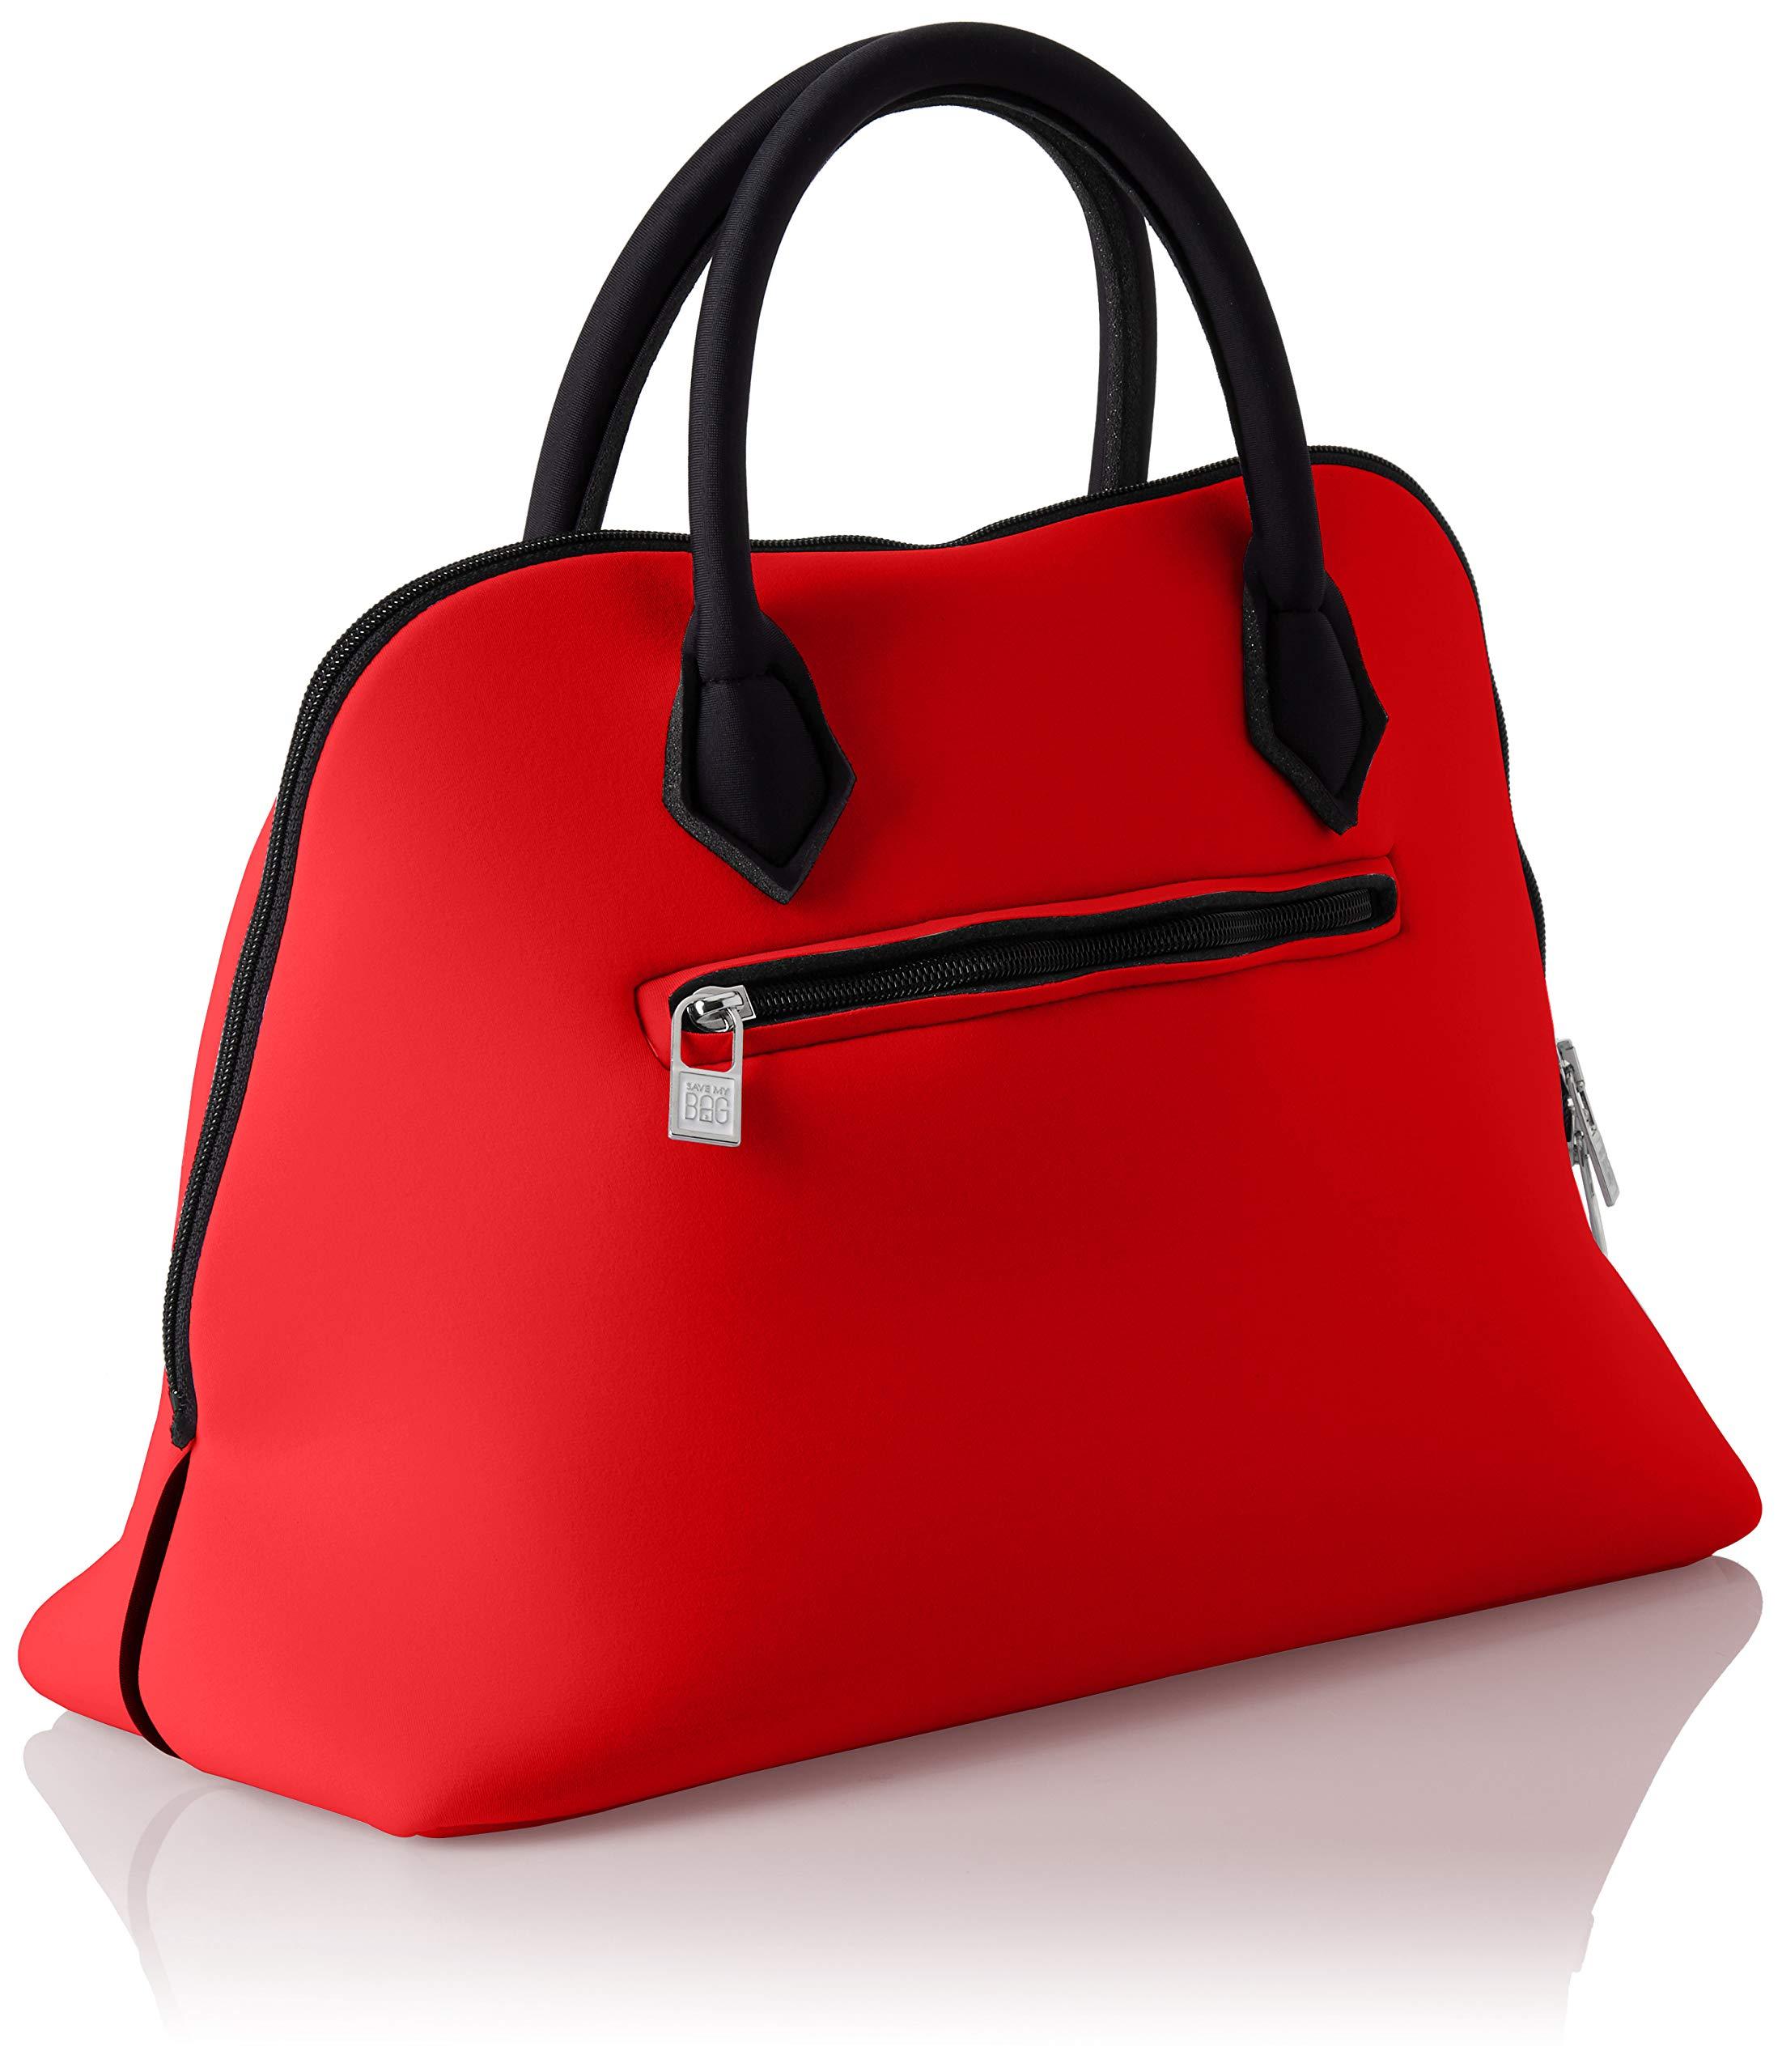 c4722f46a529a2 Save My Bag Women's Princess Midi Top-Handle Bag - Vegan Designer Bags